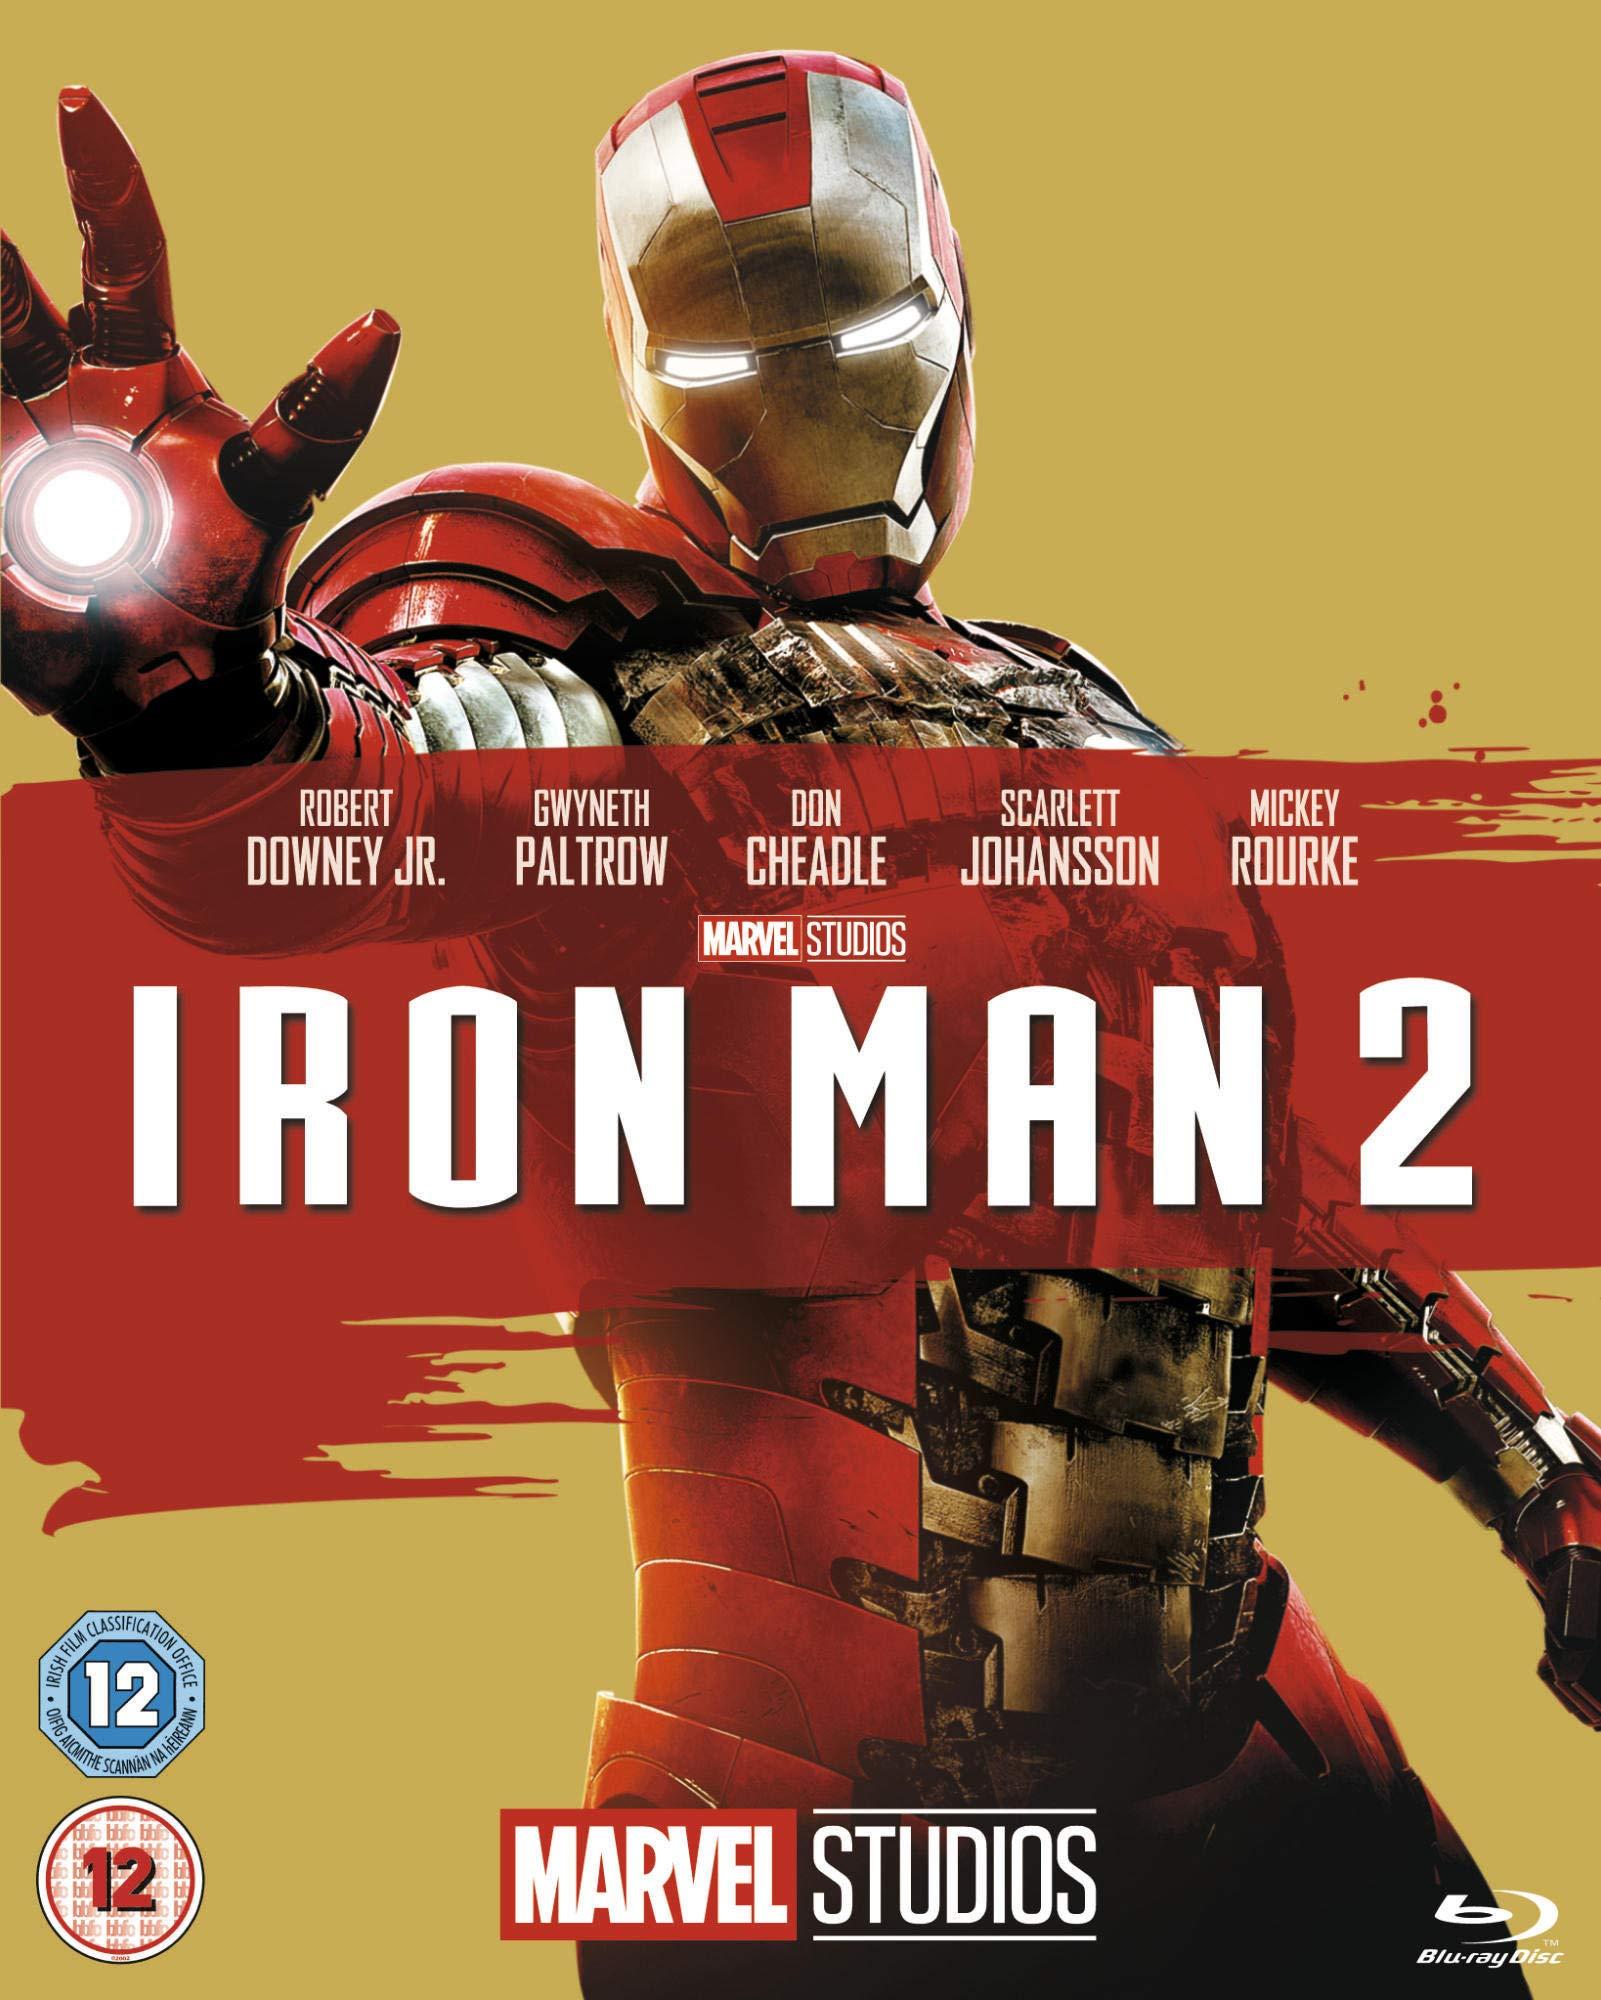 Marvel Cinematic Universe film 3 - Iron Man 2